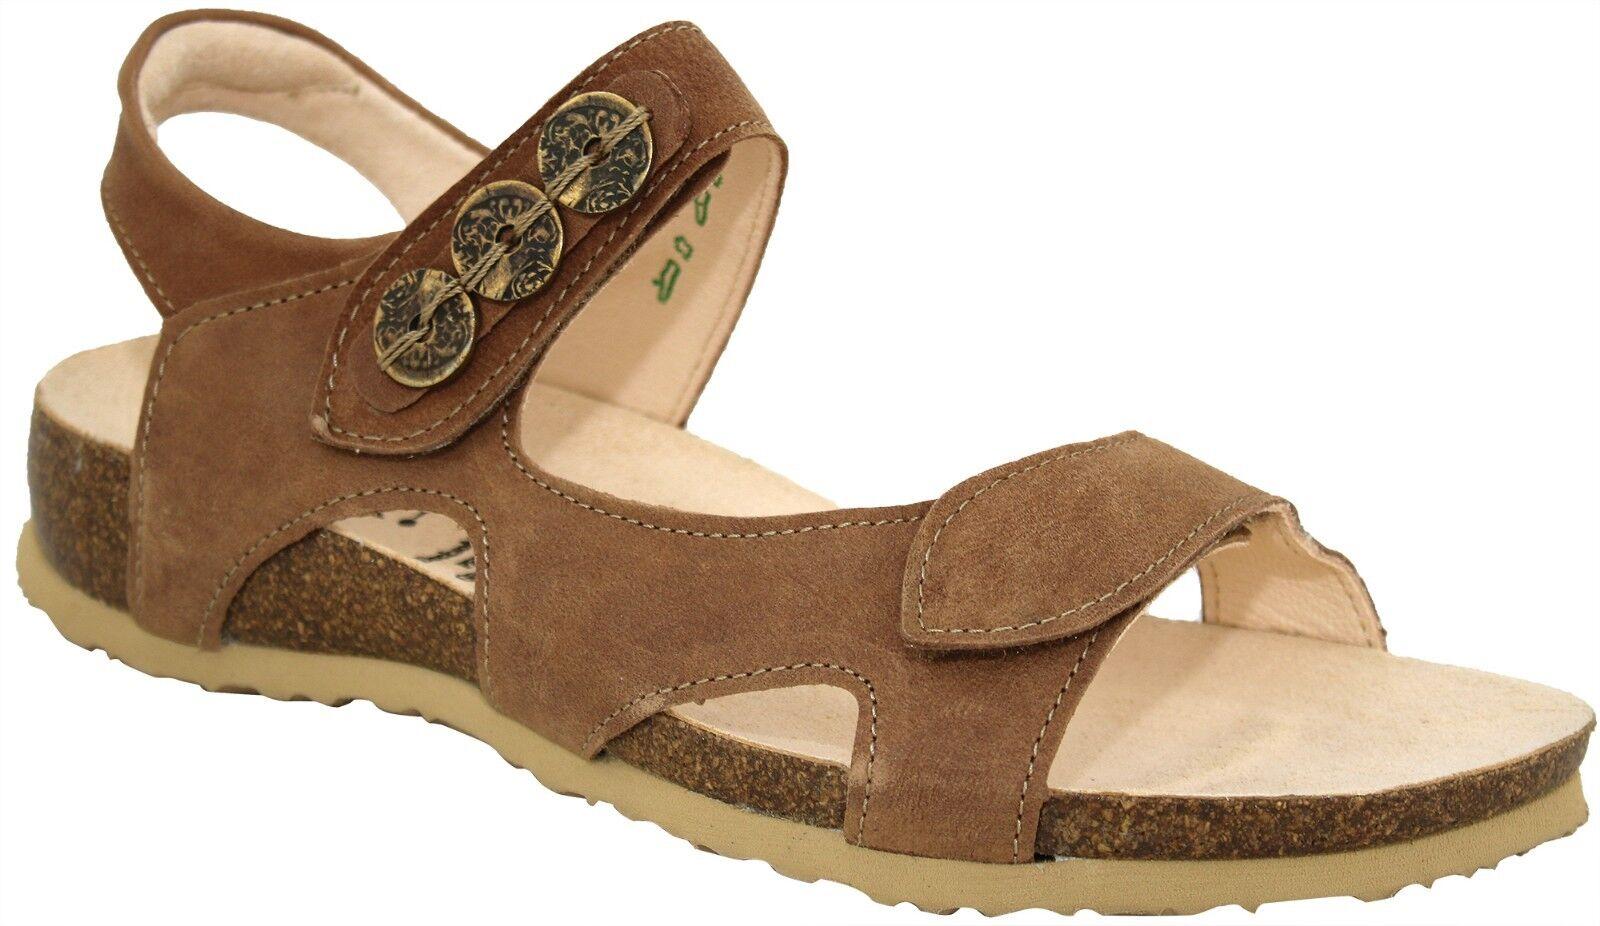 Think  82988 55 Sandalo da Donna Donna Donna Donna da j67 Julia 6401a6   ecfae7